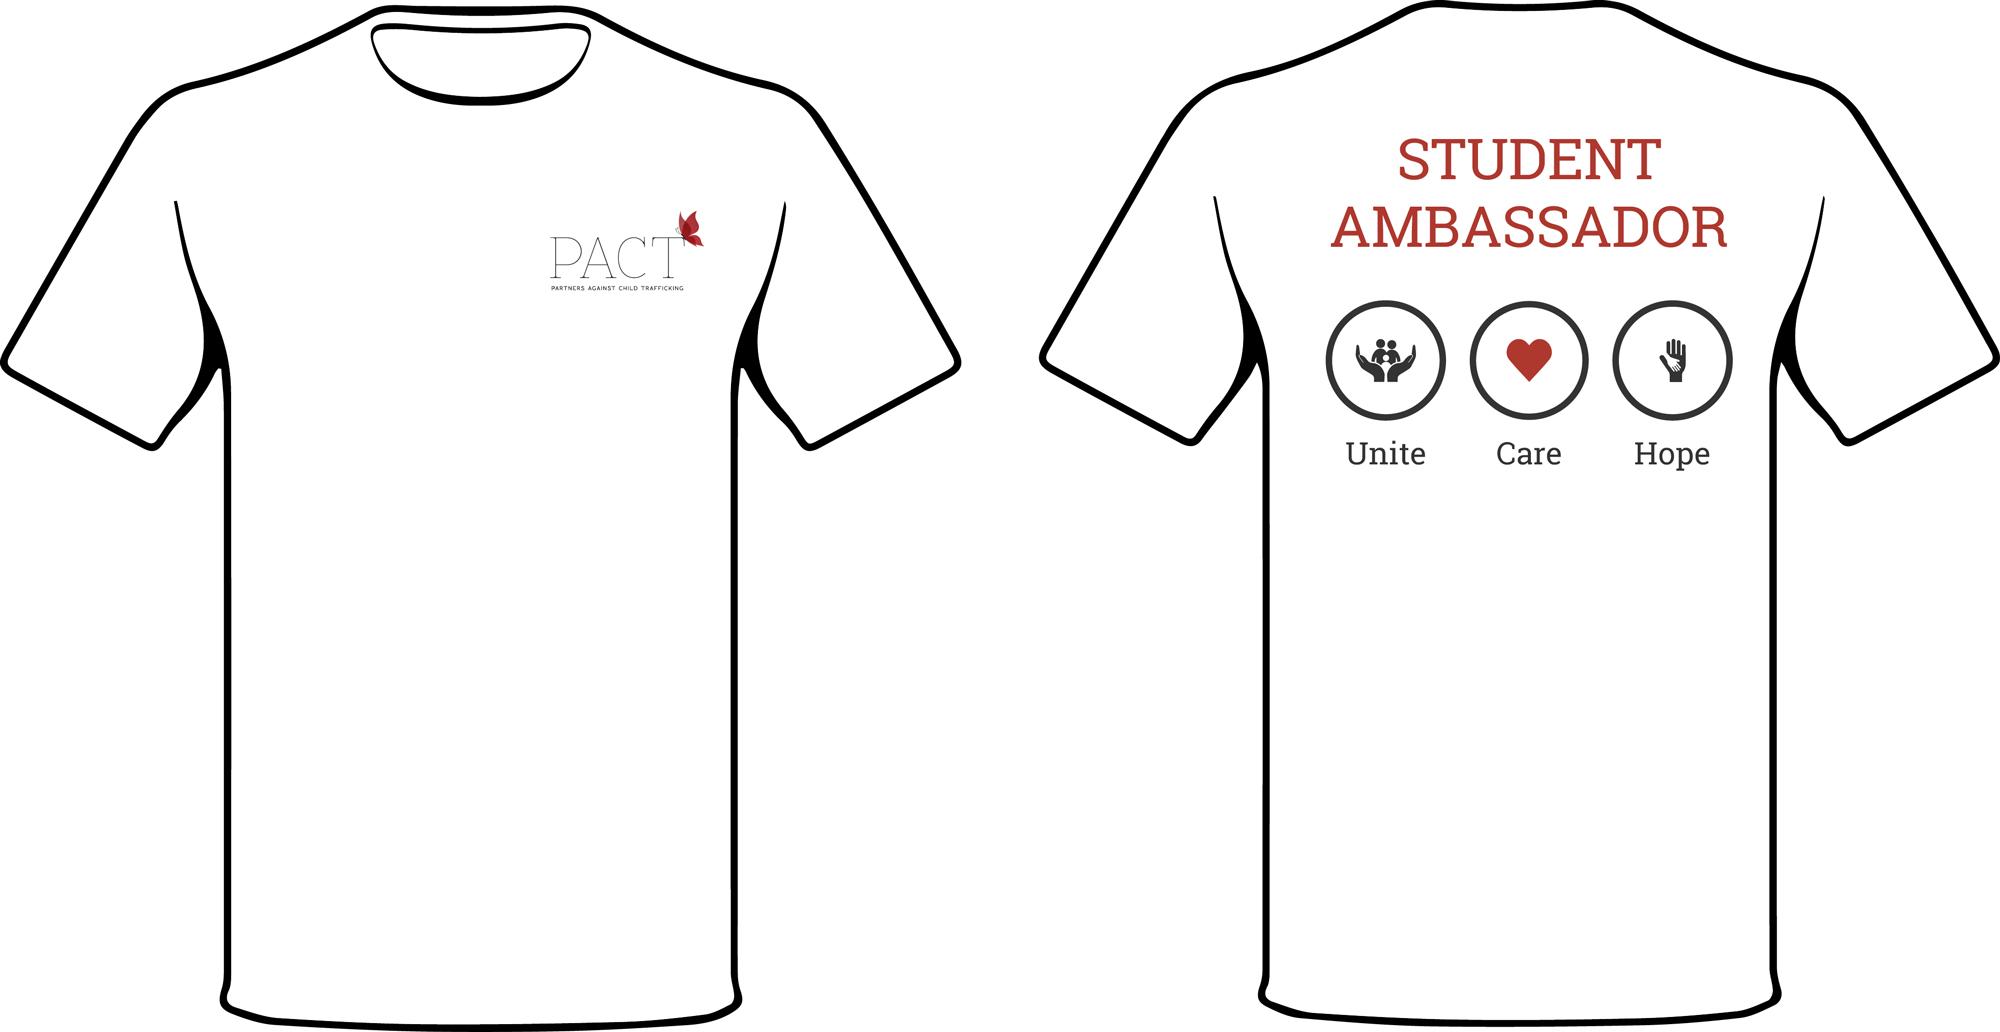 Student Ambassador Shirt